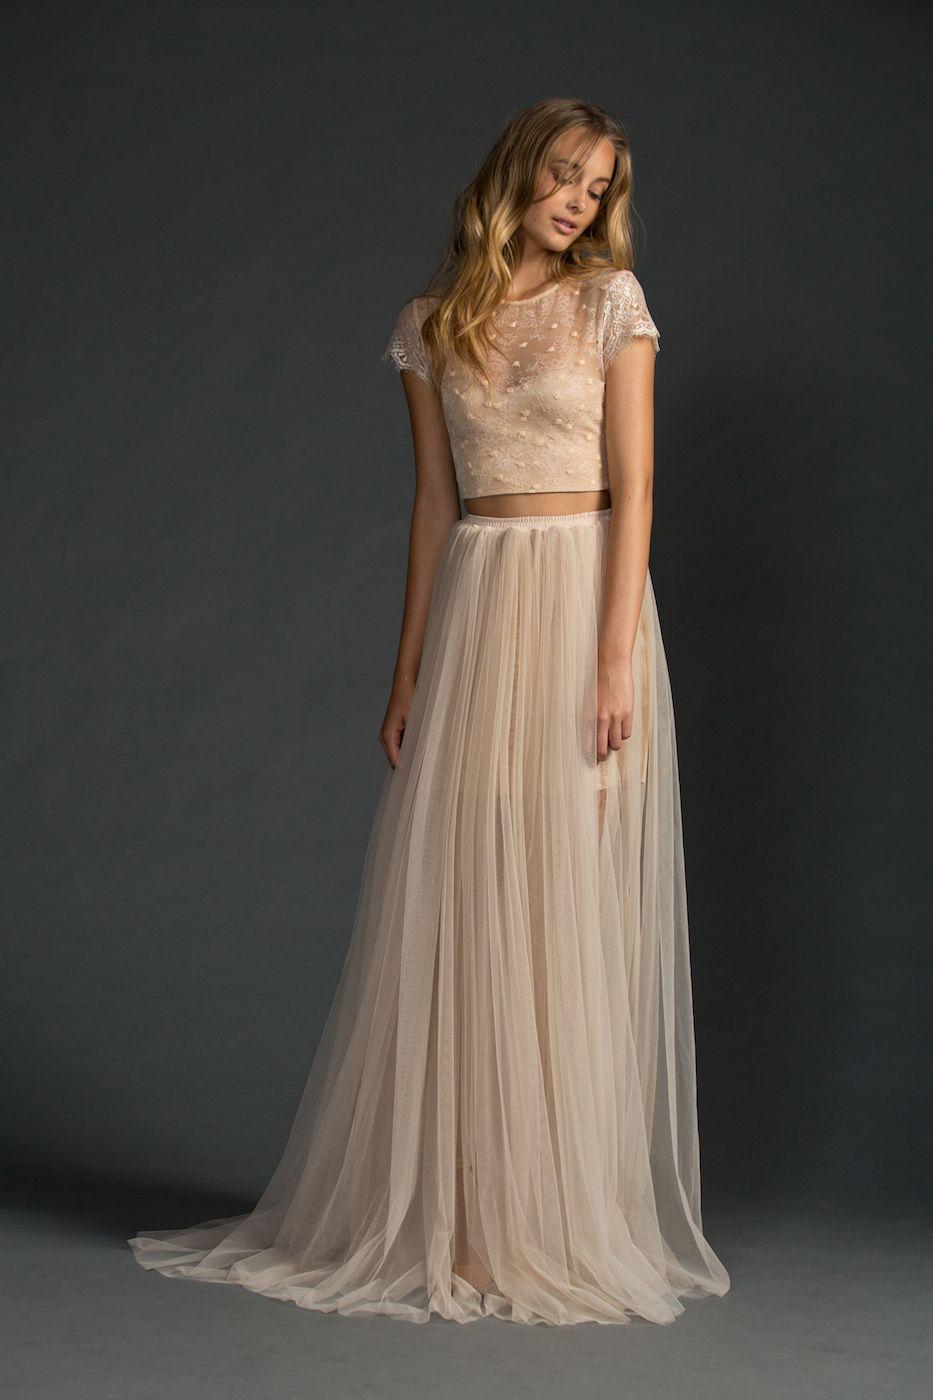 Chantilly lace bridesmaid dresses